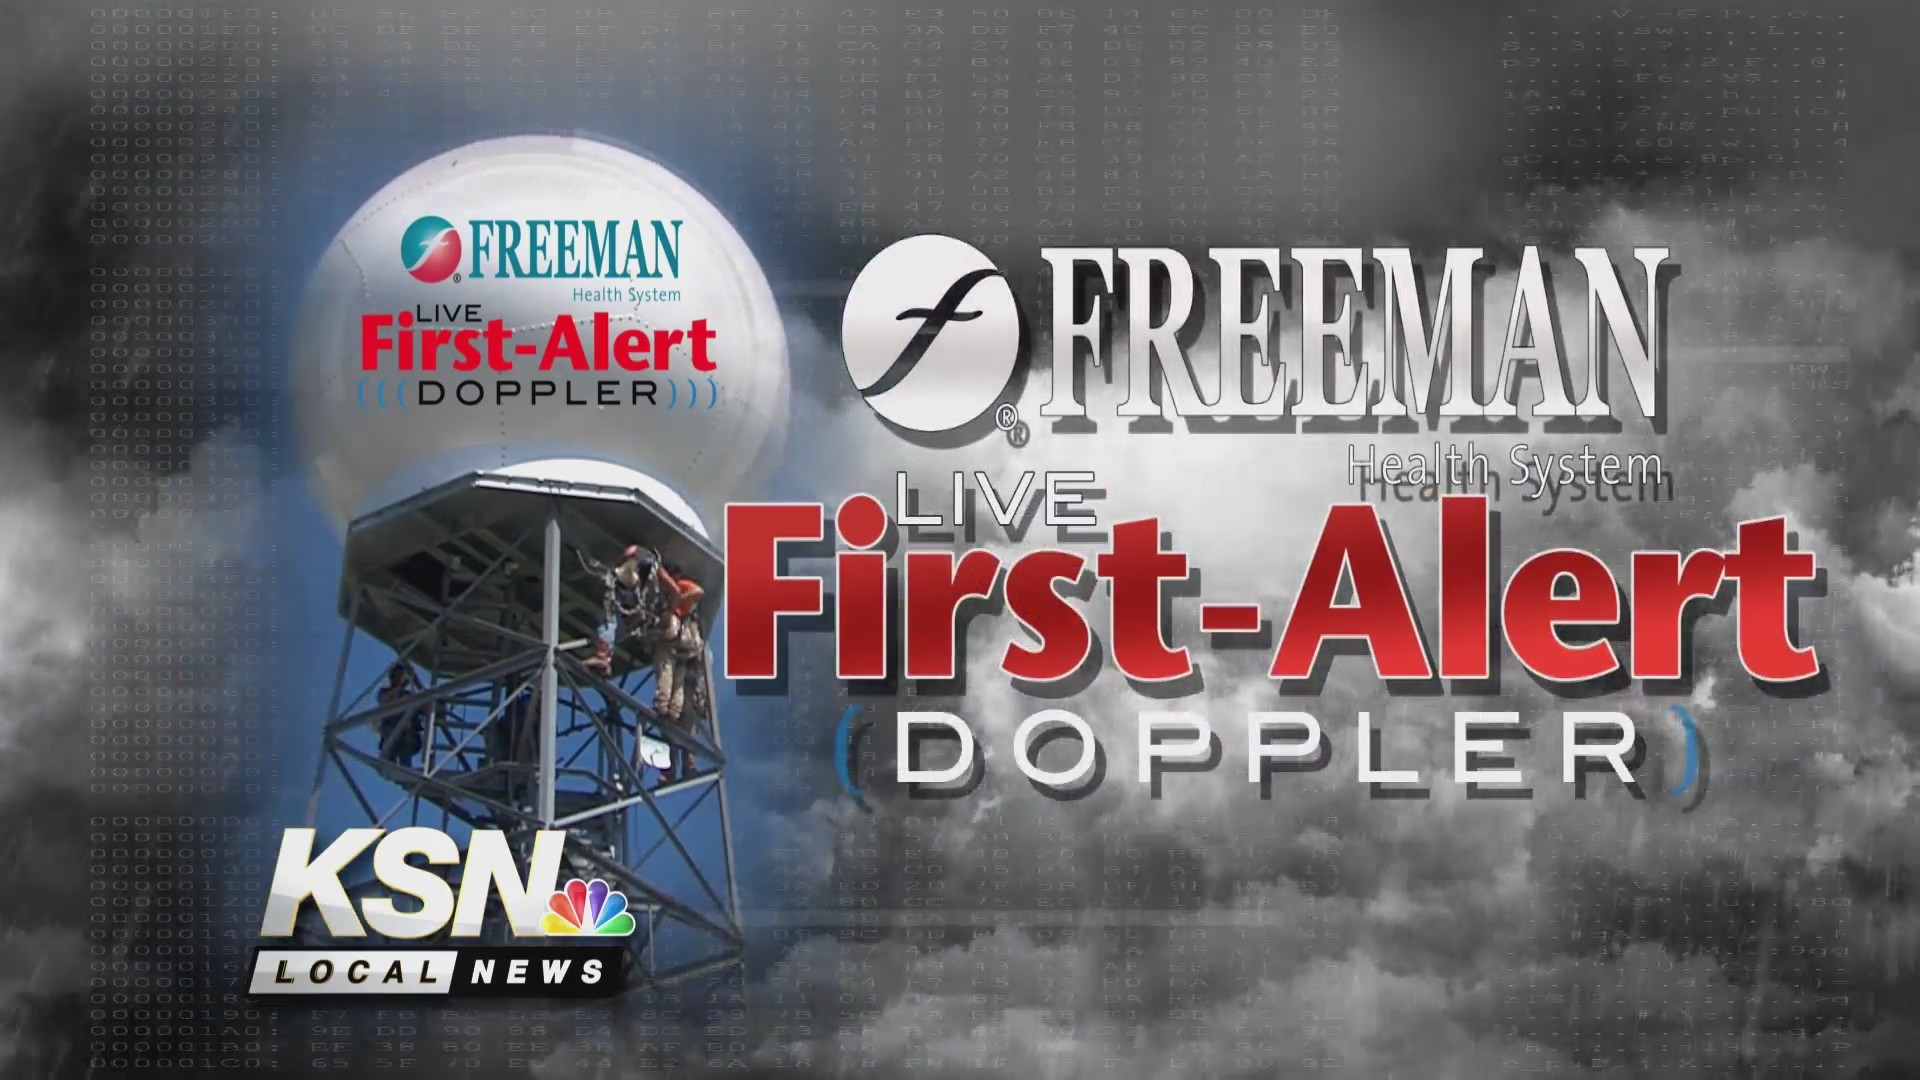 Freeman Hospital - Freeman Doppler (022519)